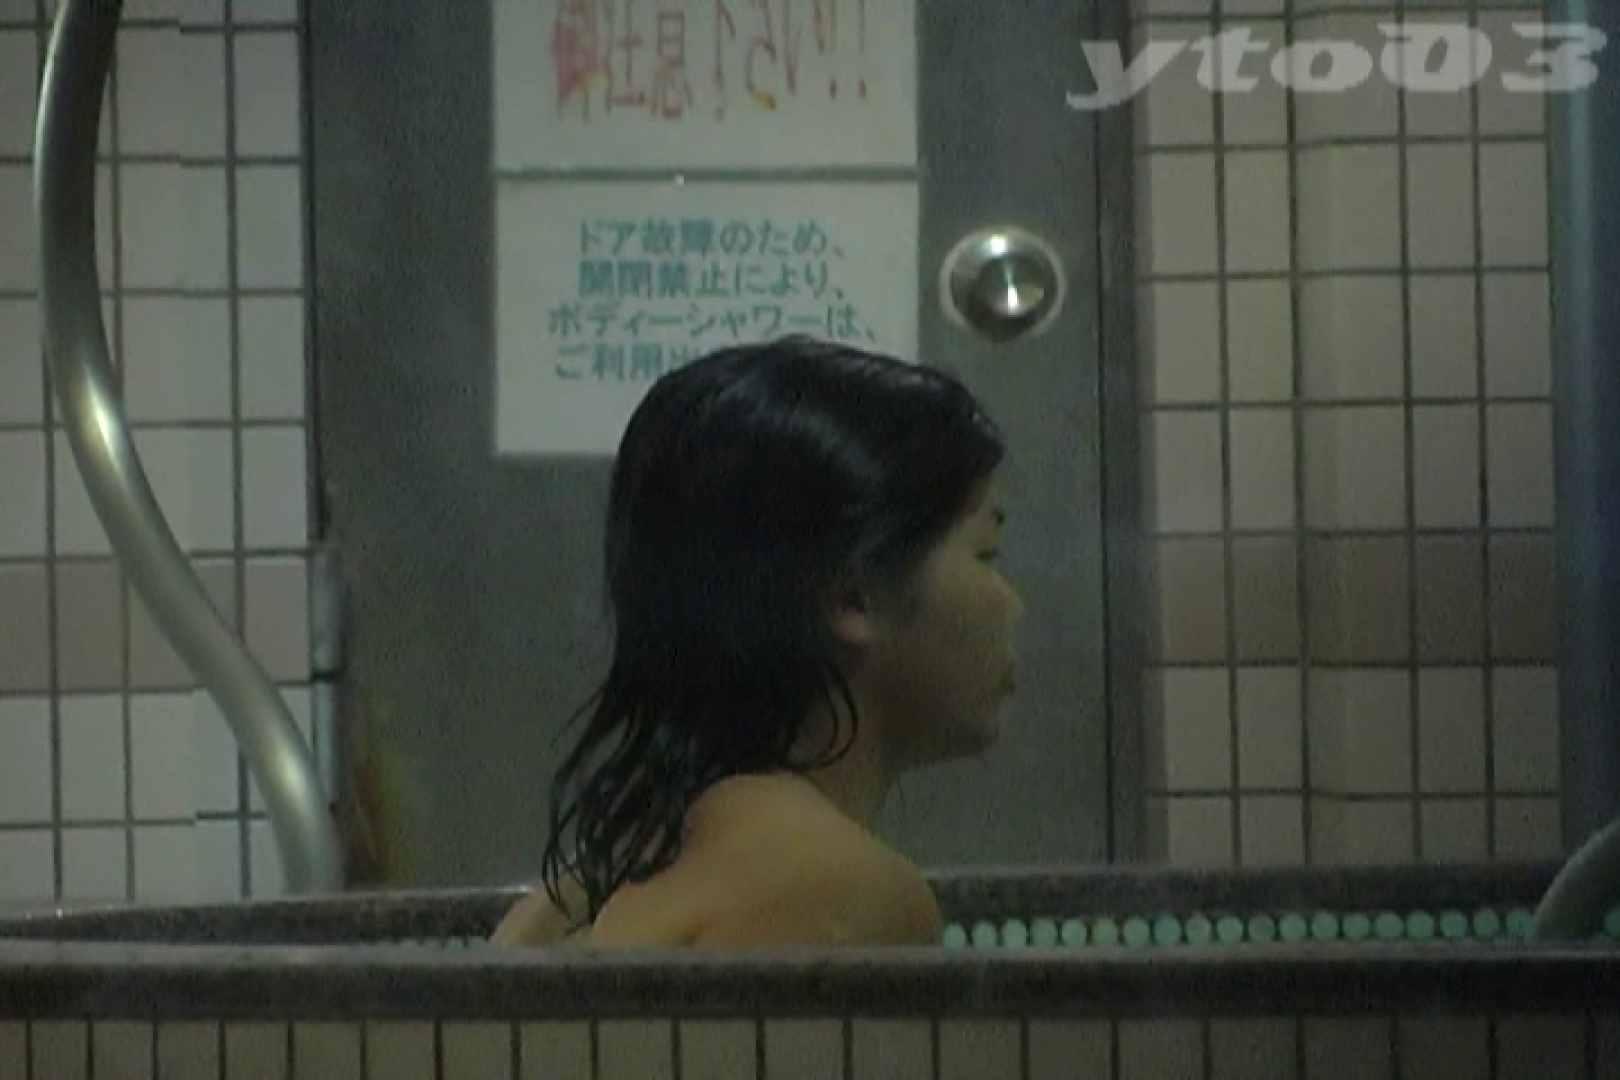 ▲復活限定▲合宿ホテル女風呂盗撮 Vol.17 合宿中の出来事 盗撮 100画像 8